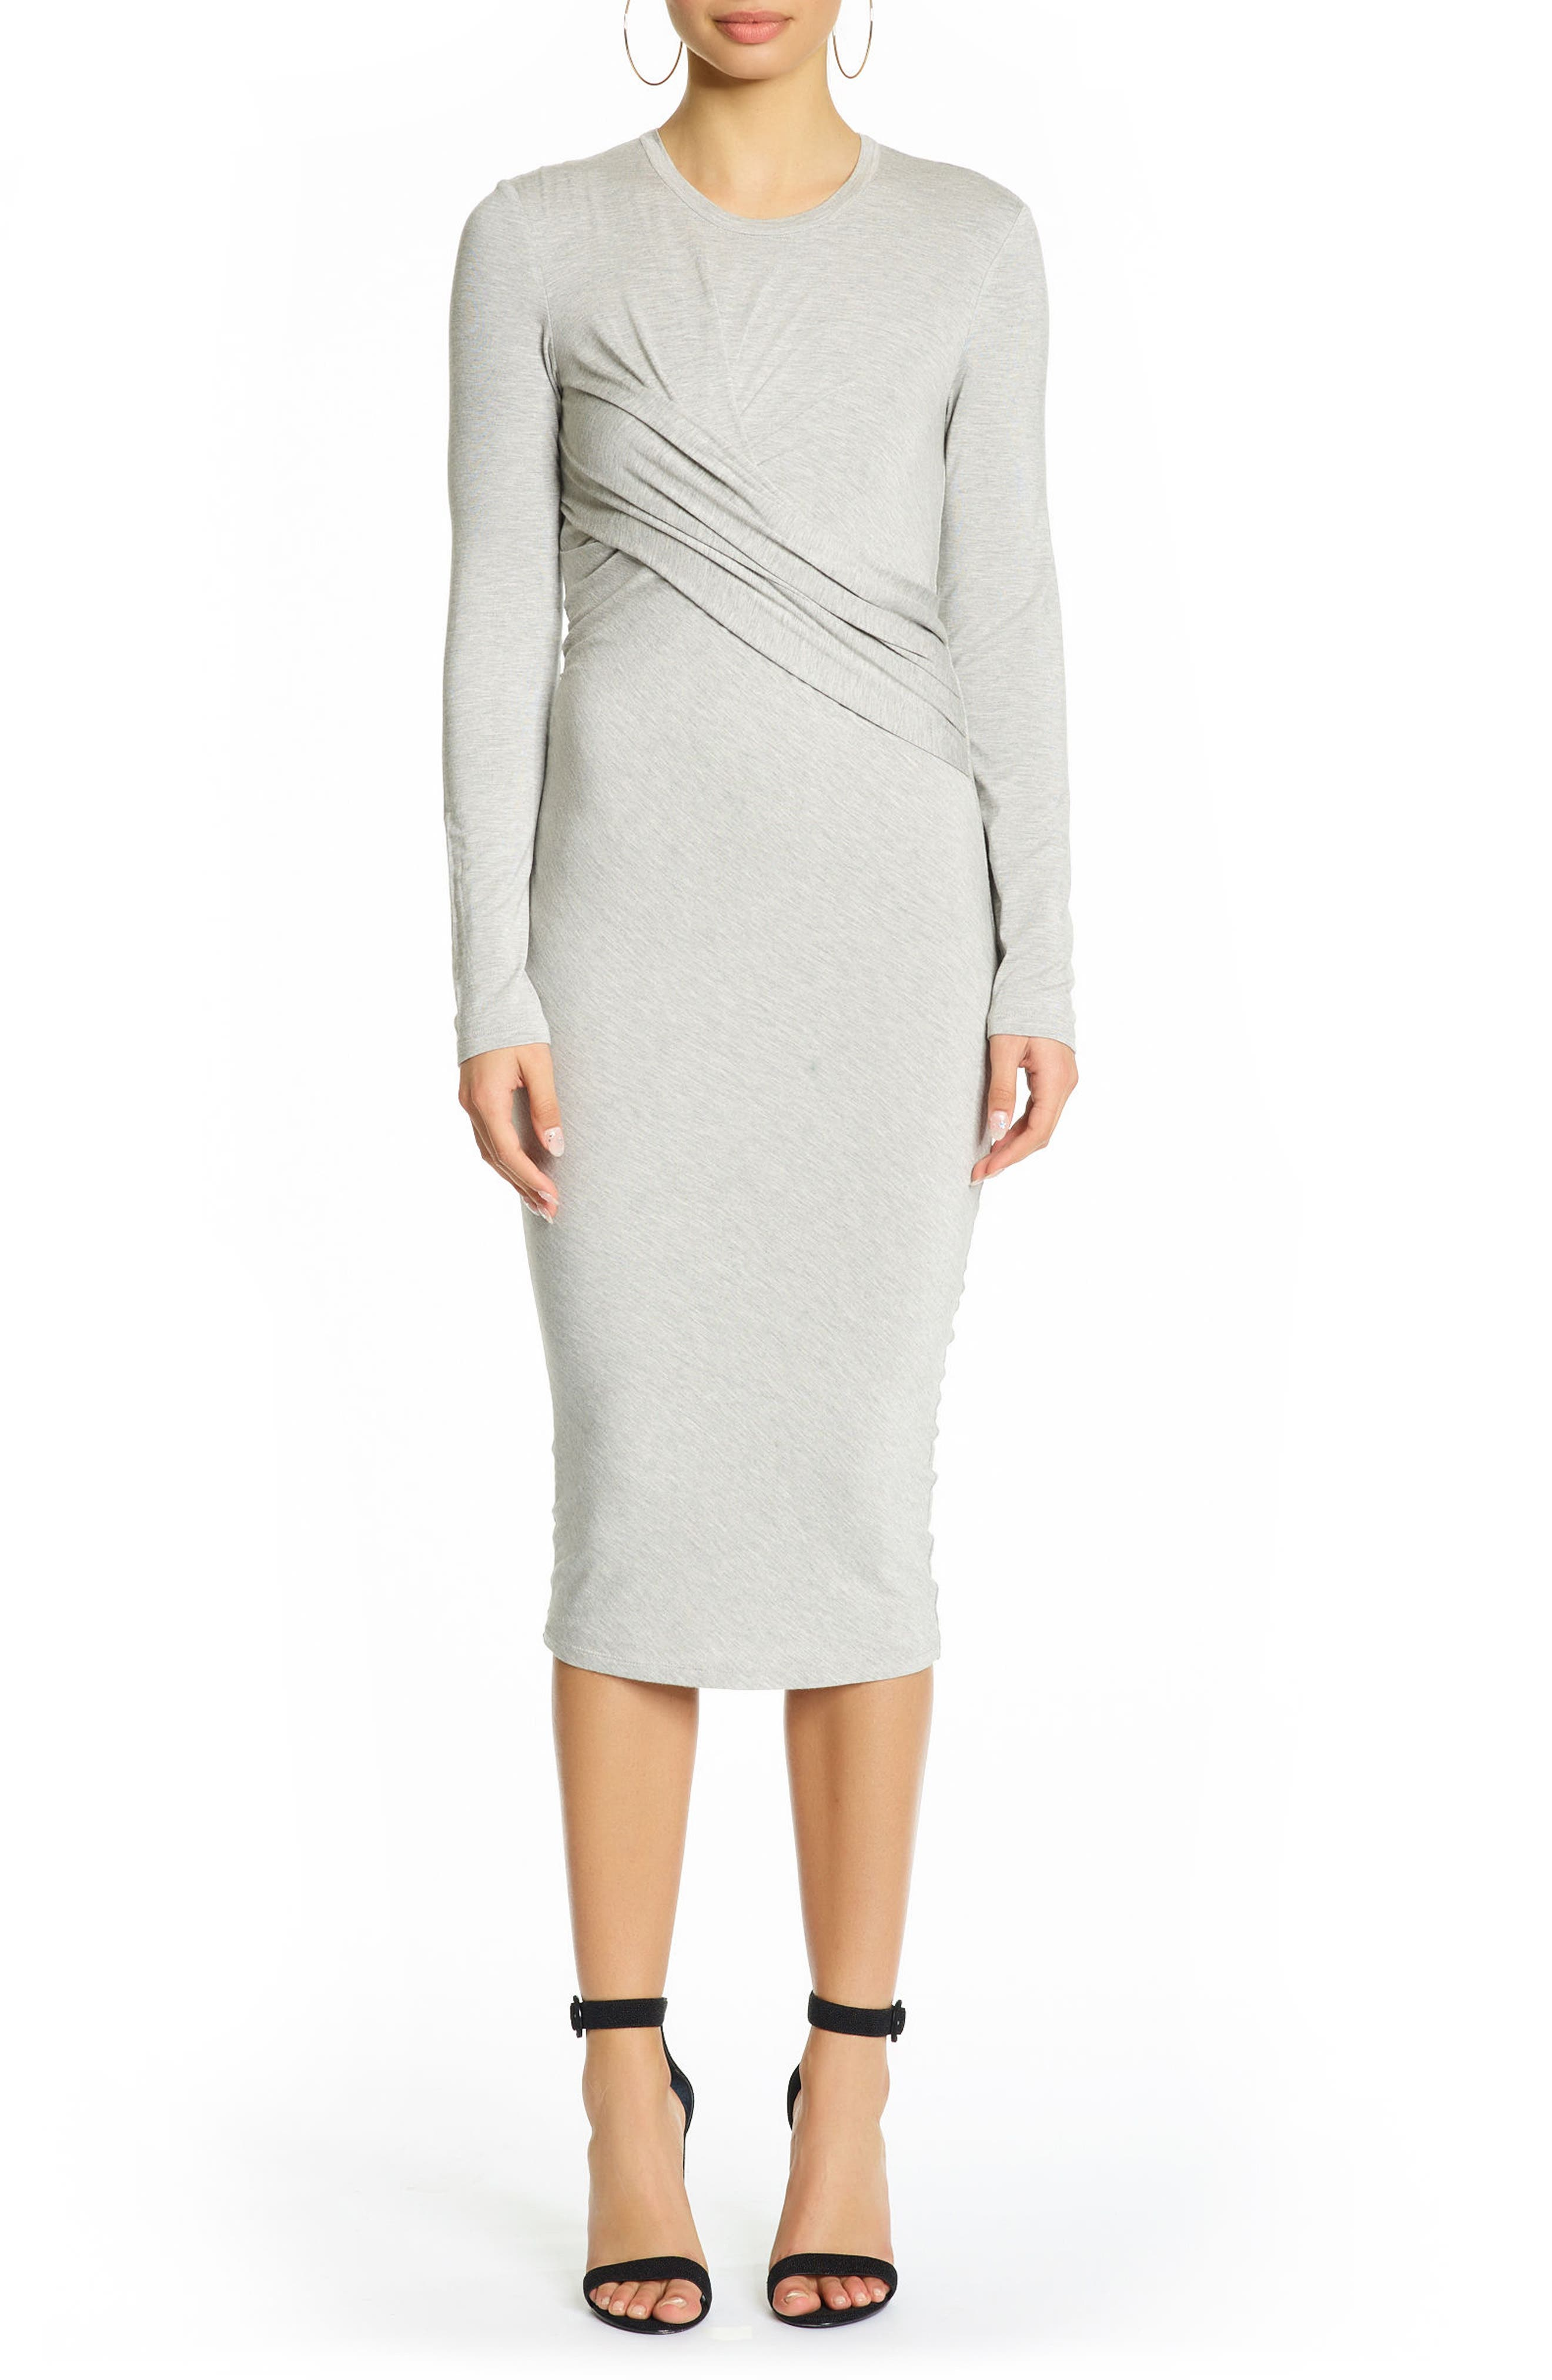 KENDALL + KYLIE Long Sleeve Twist Dress